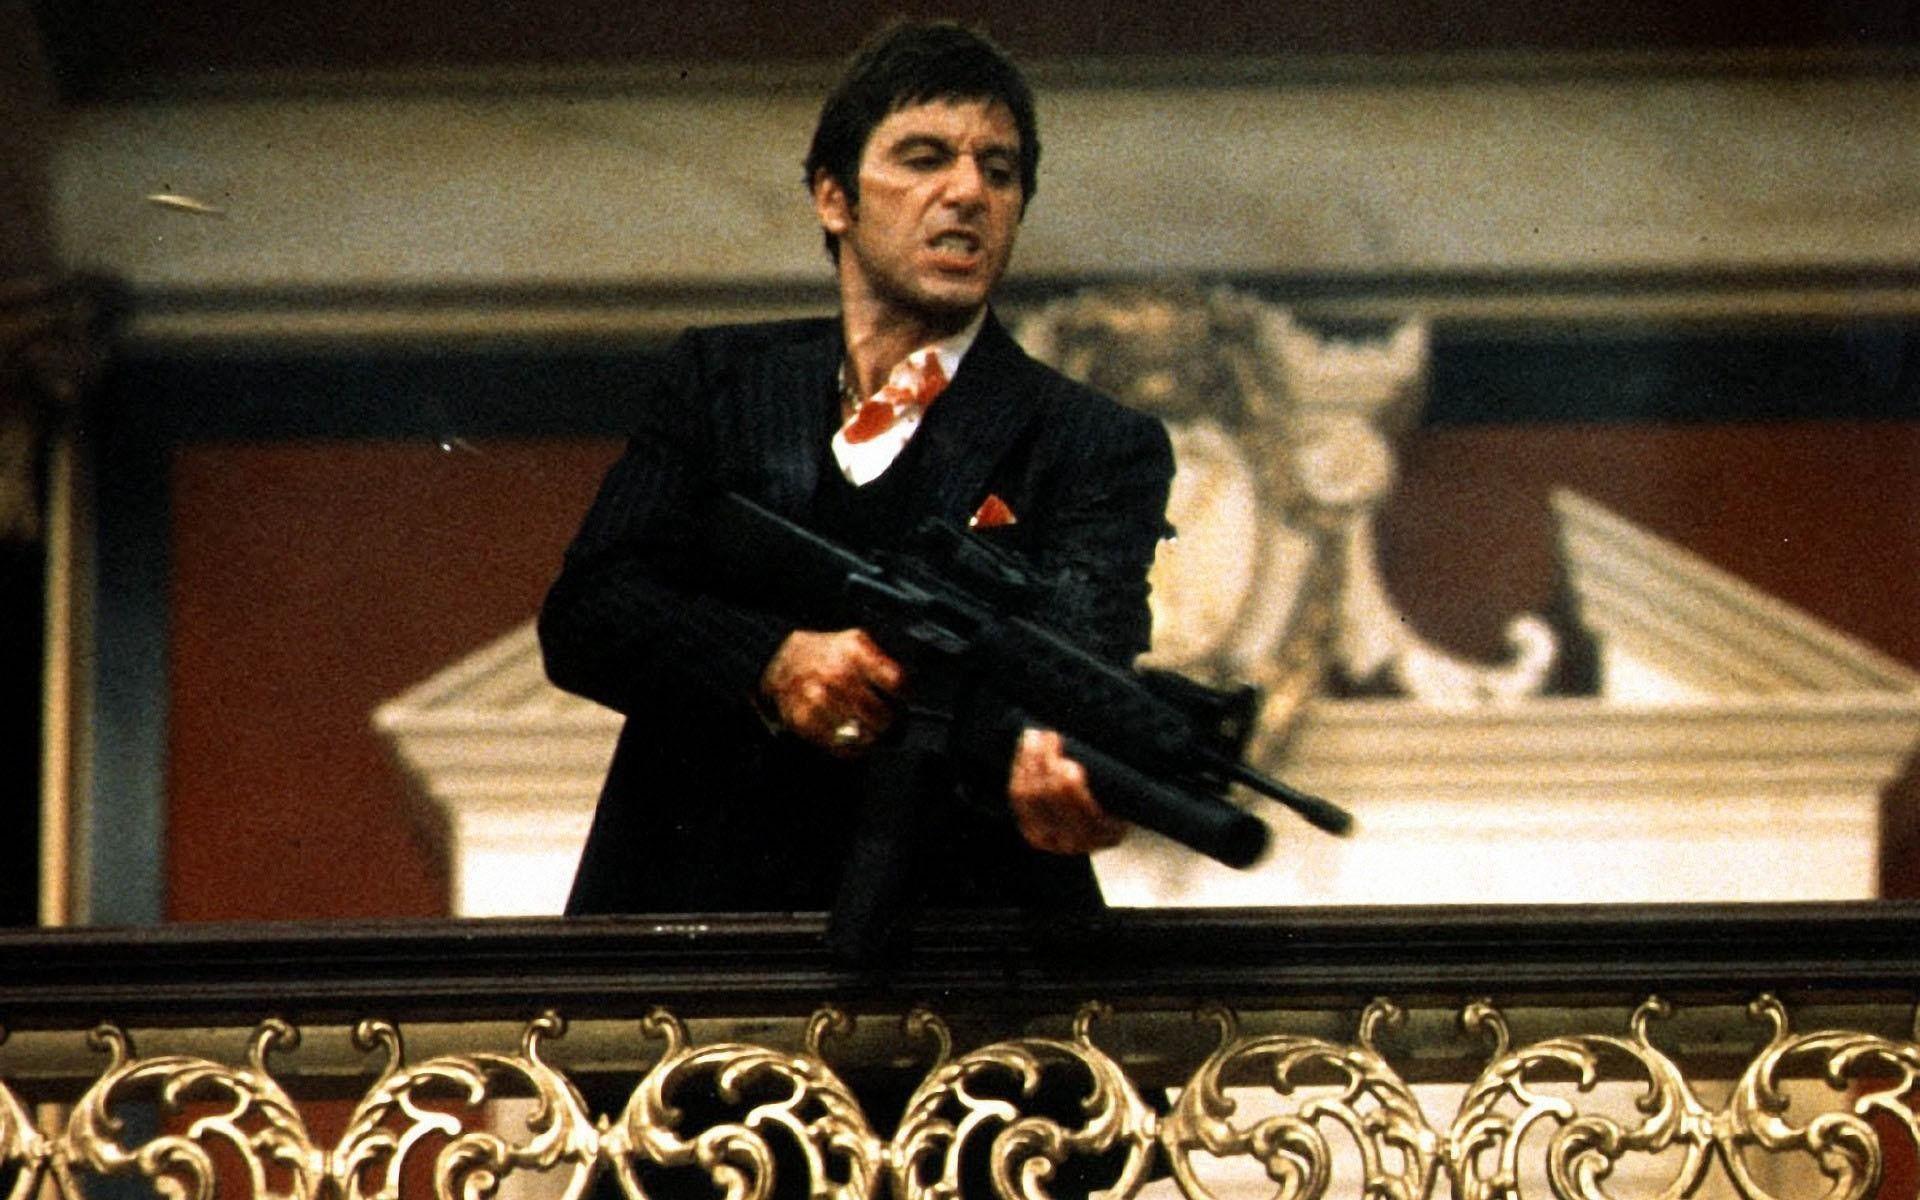 Scarface Hd Al Pacino - HD Wallpaper